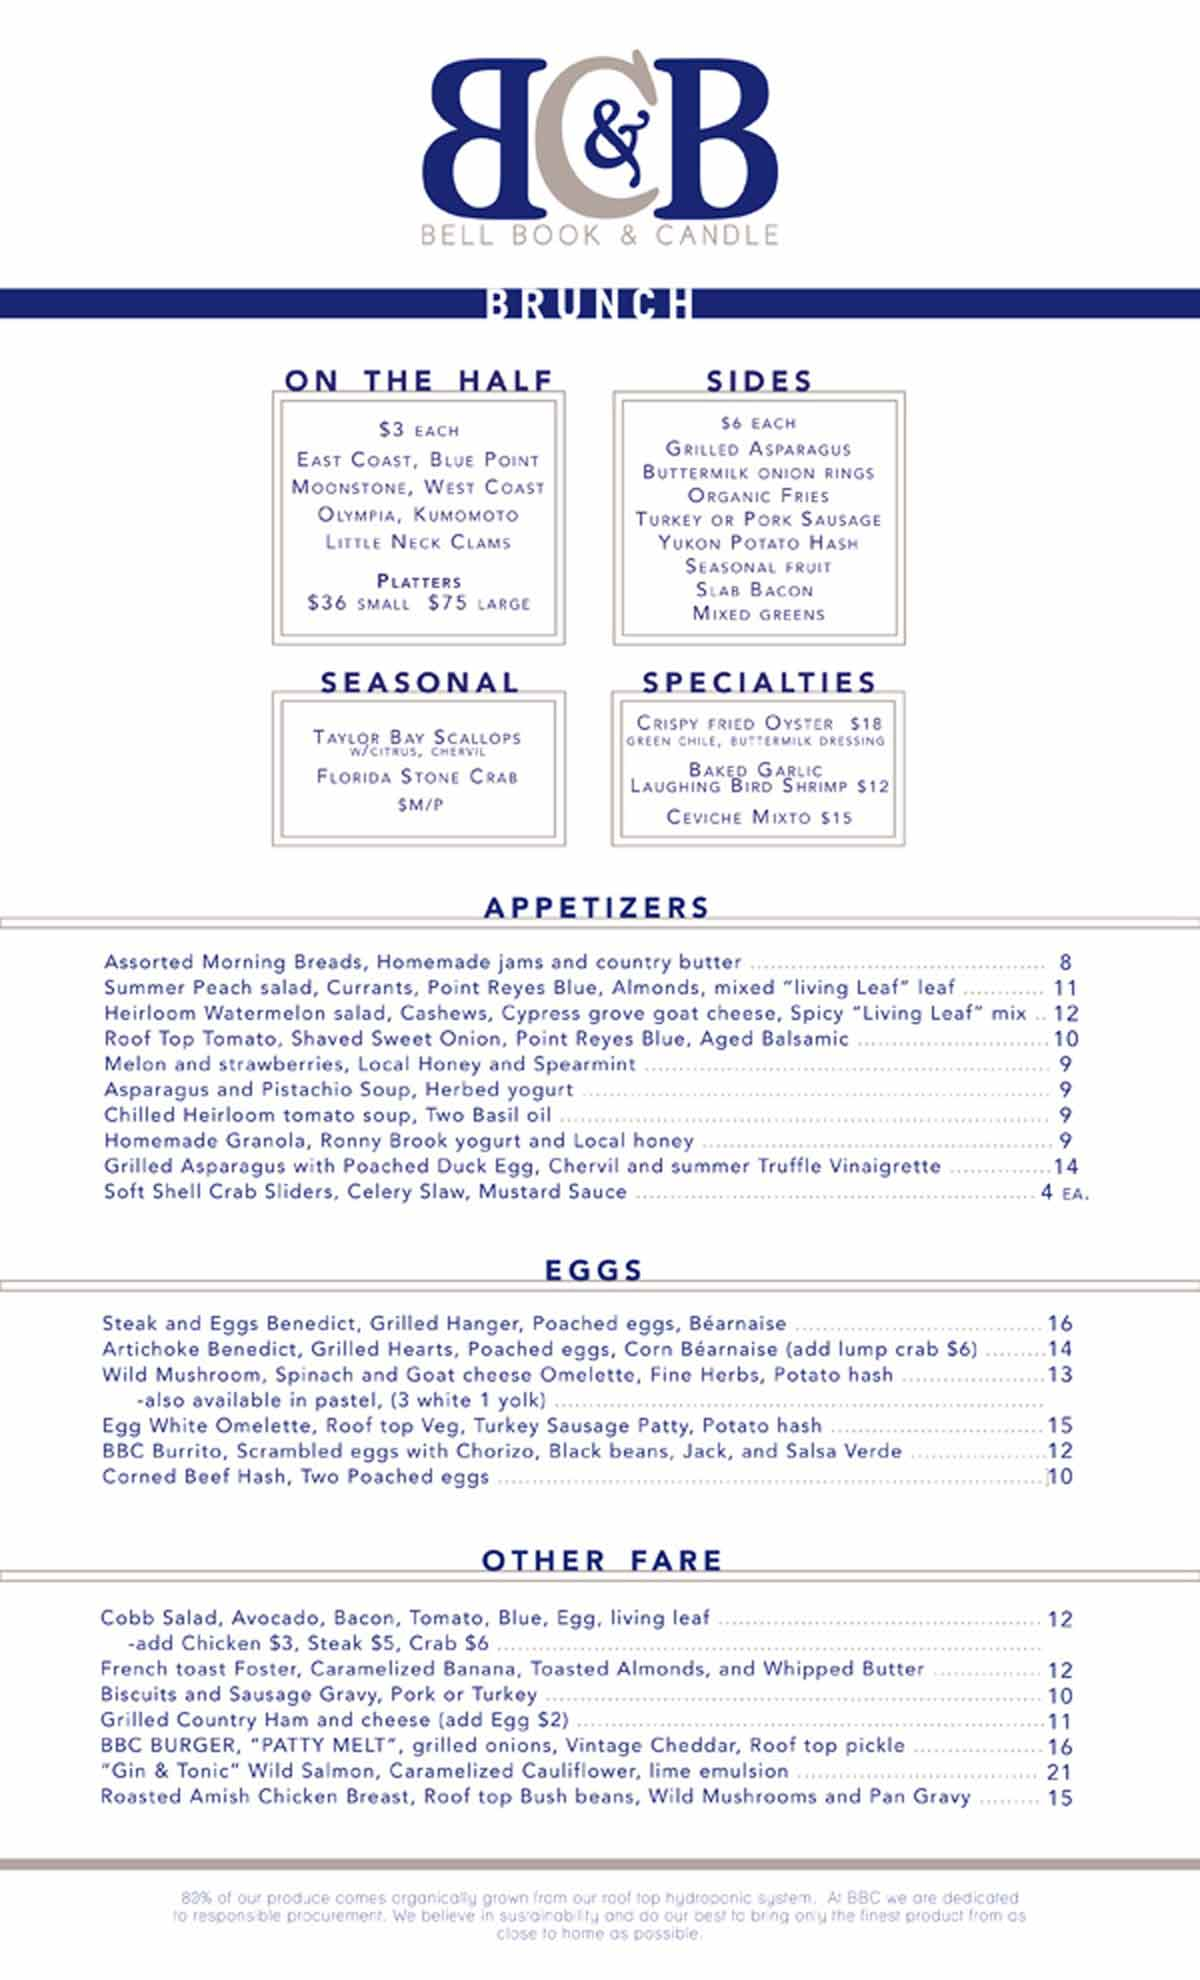 Bell Book & Candle Restaurant Menu Design